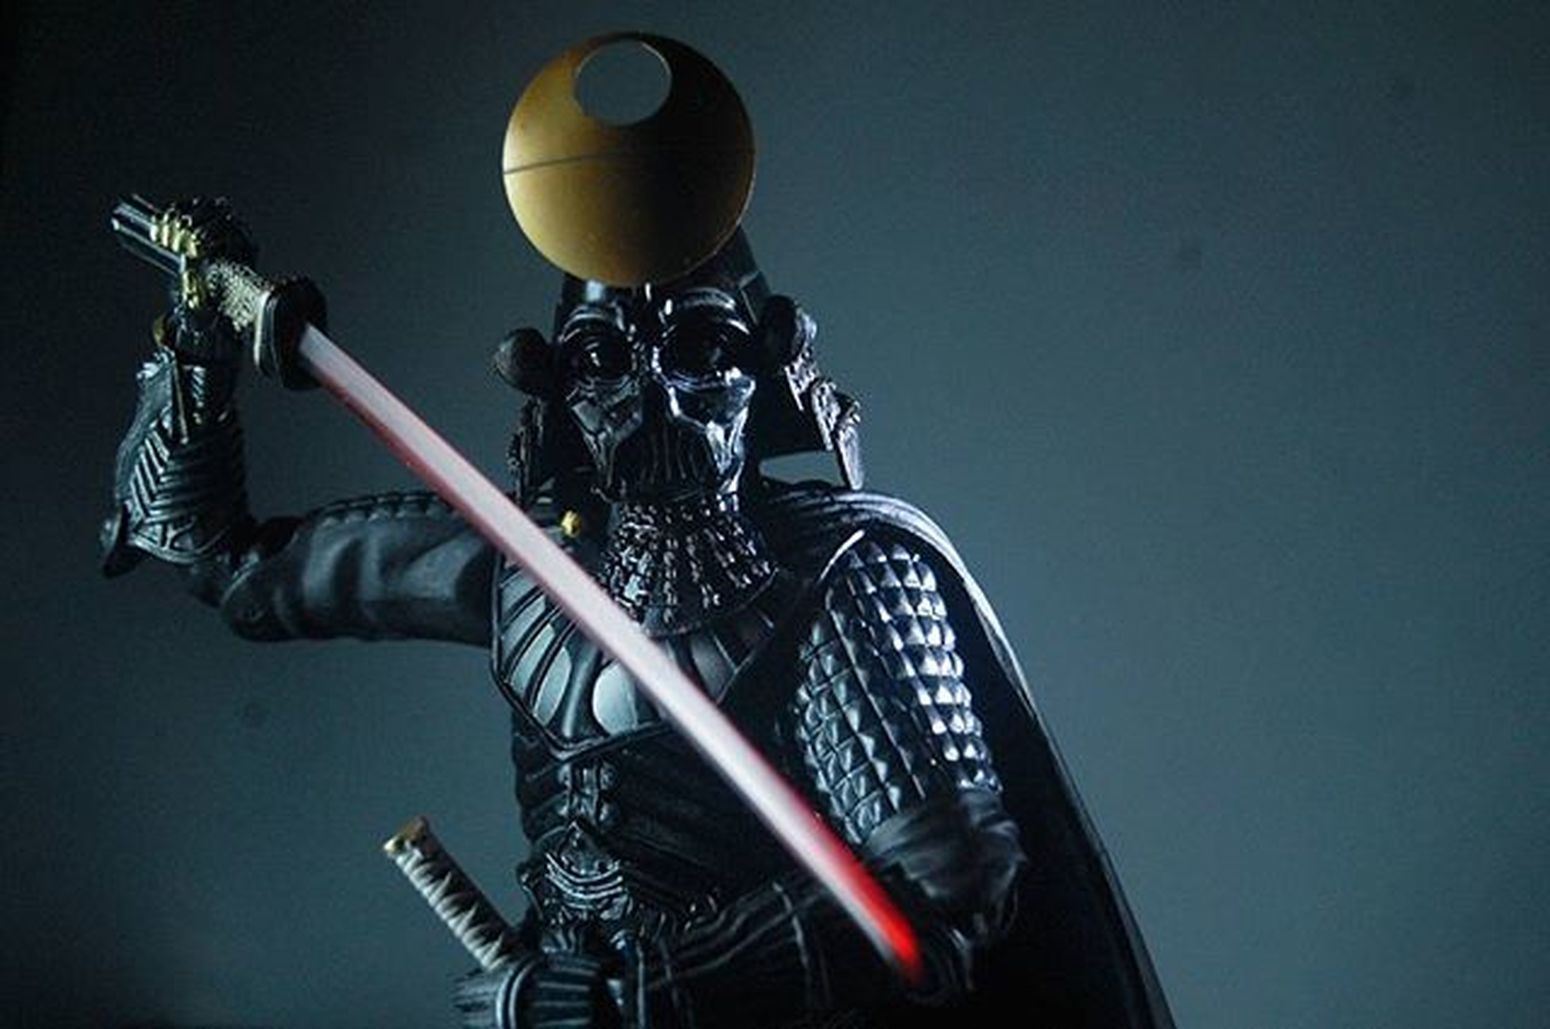 Feudal Lord Vader Starwars Starwarstoyfigs Movierealization Samuraitaisho Darthvader Toyphotography Toyphotogram Toyartistry Toyalliance Toycrewbuddies Justanothertoygroup